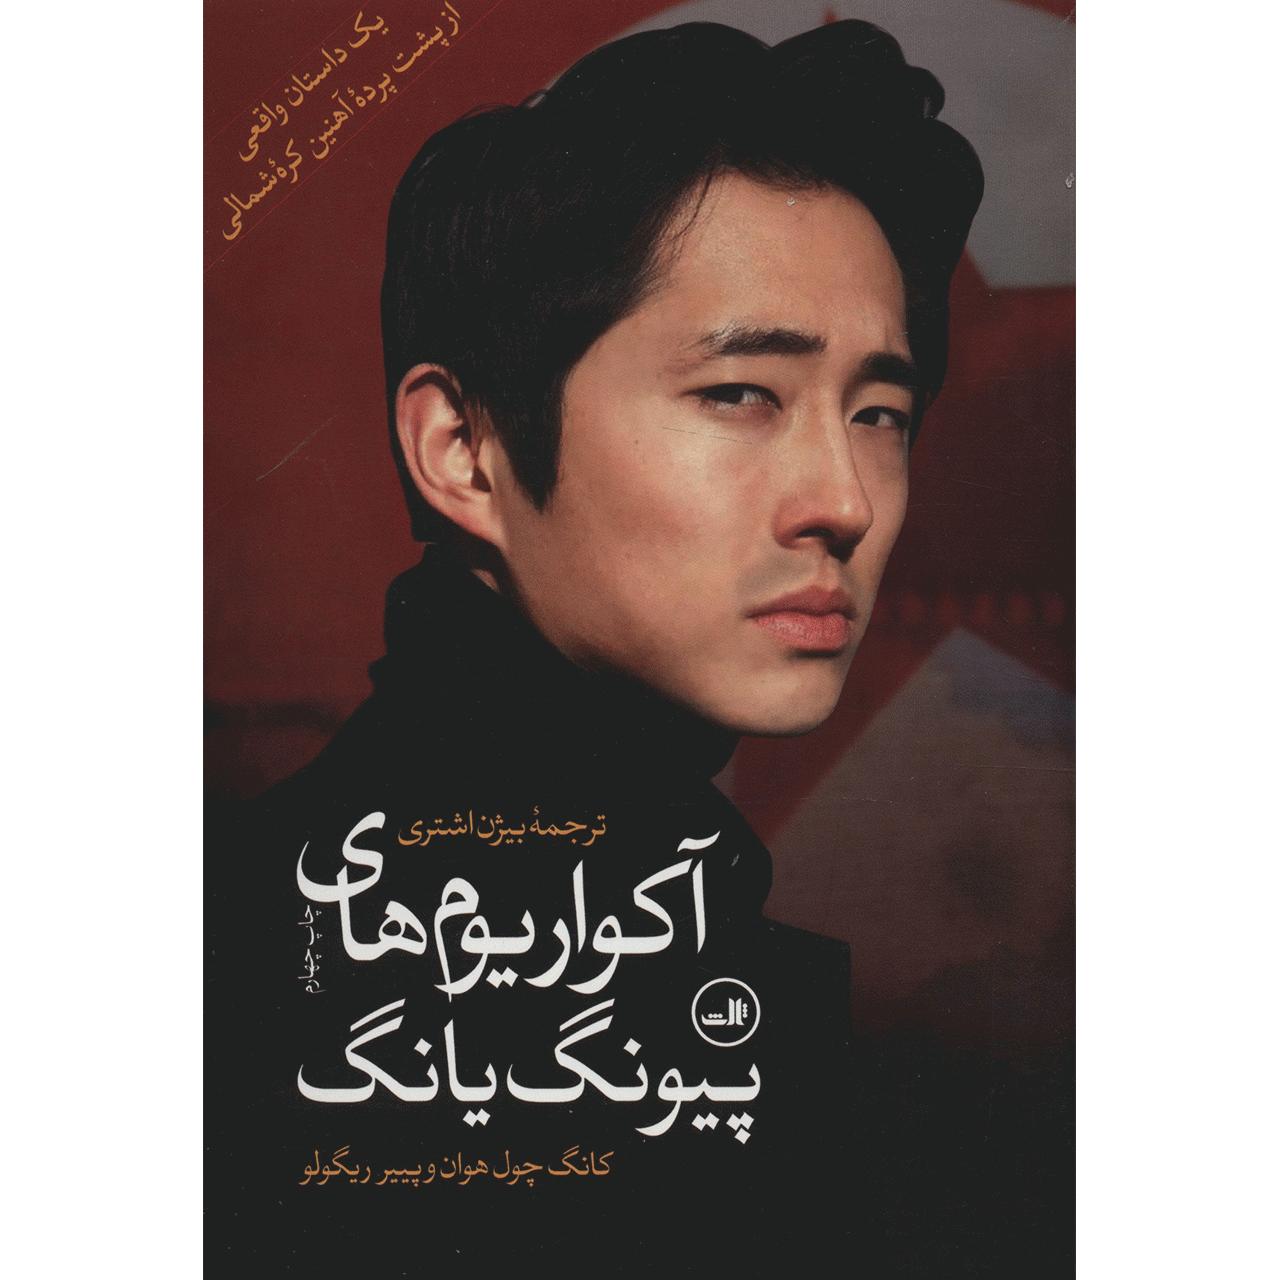 کتاب آکواریوم های پیونگ یانگ اثر کانگ چول